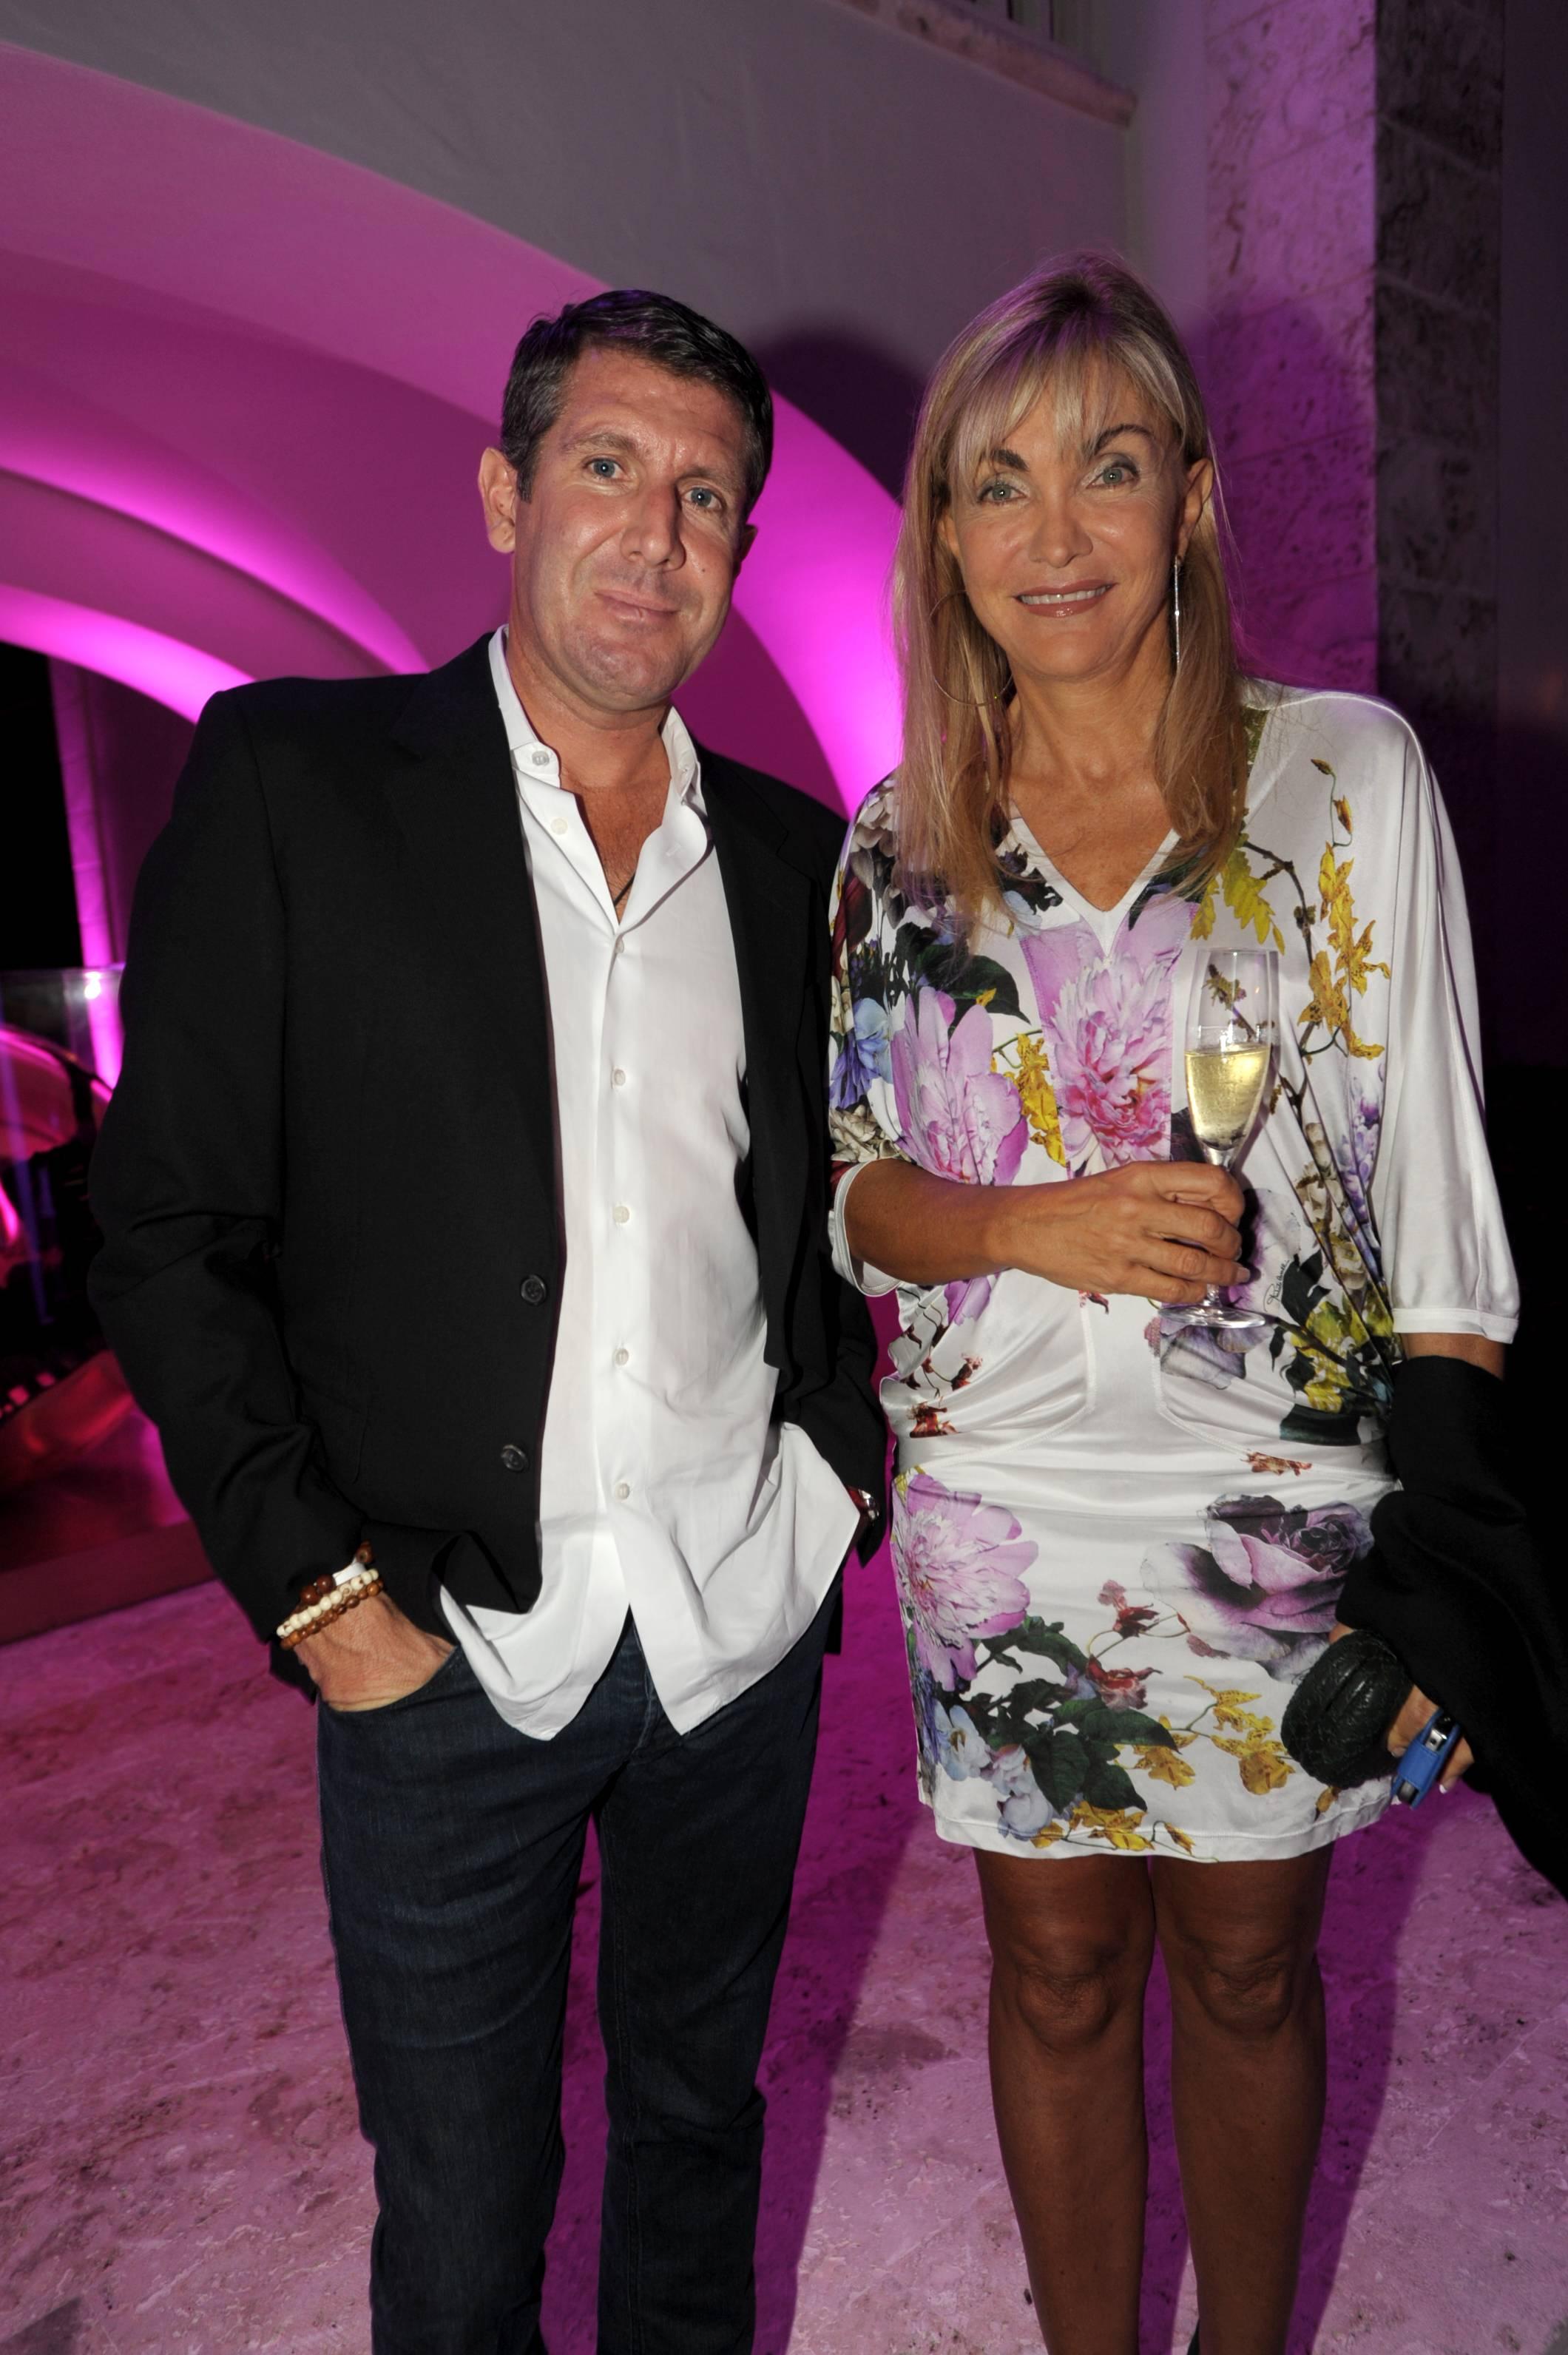 Michael Capponi & Klara Dallas